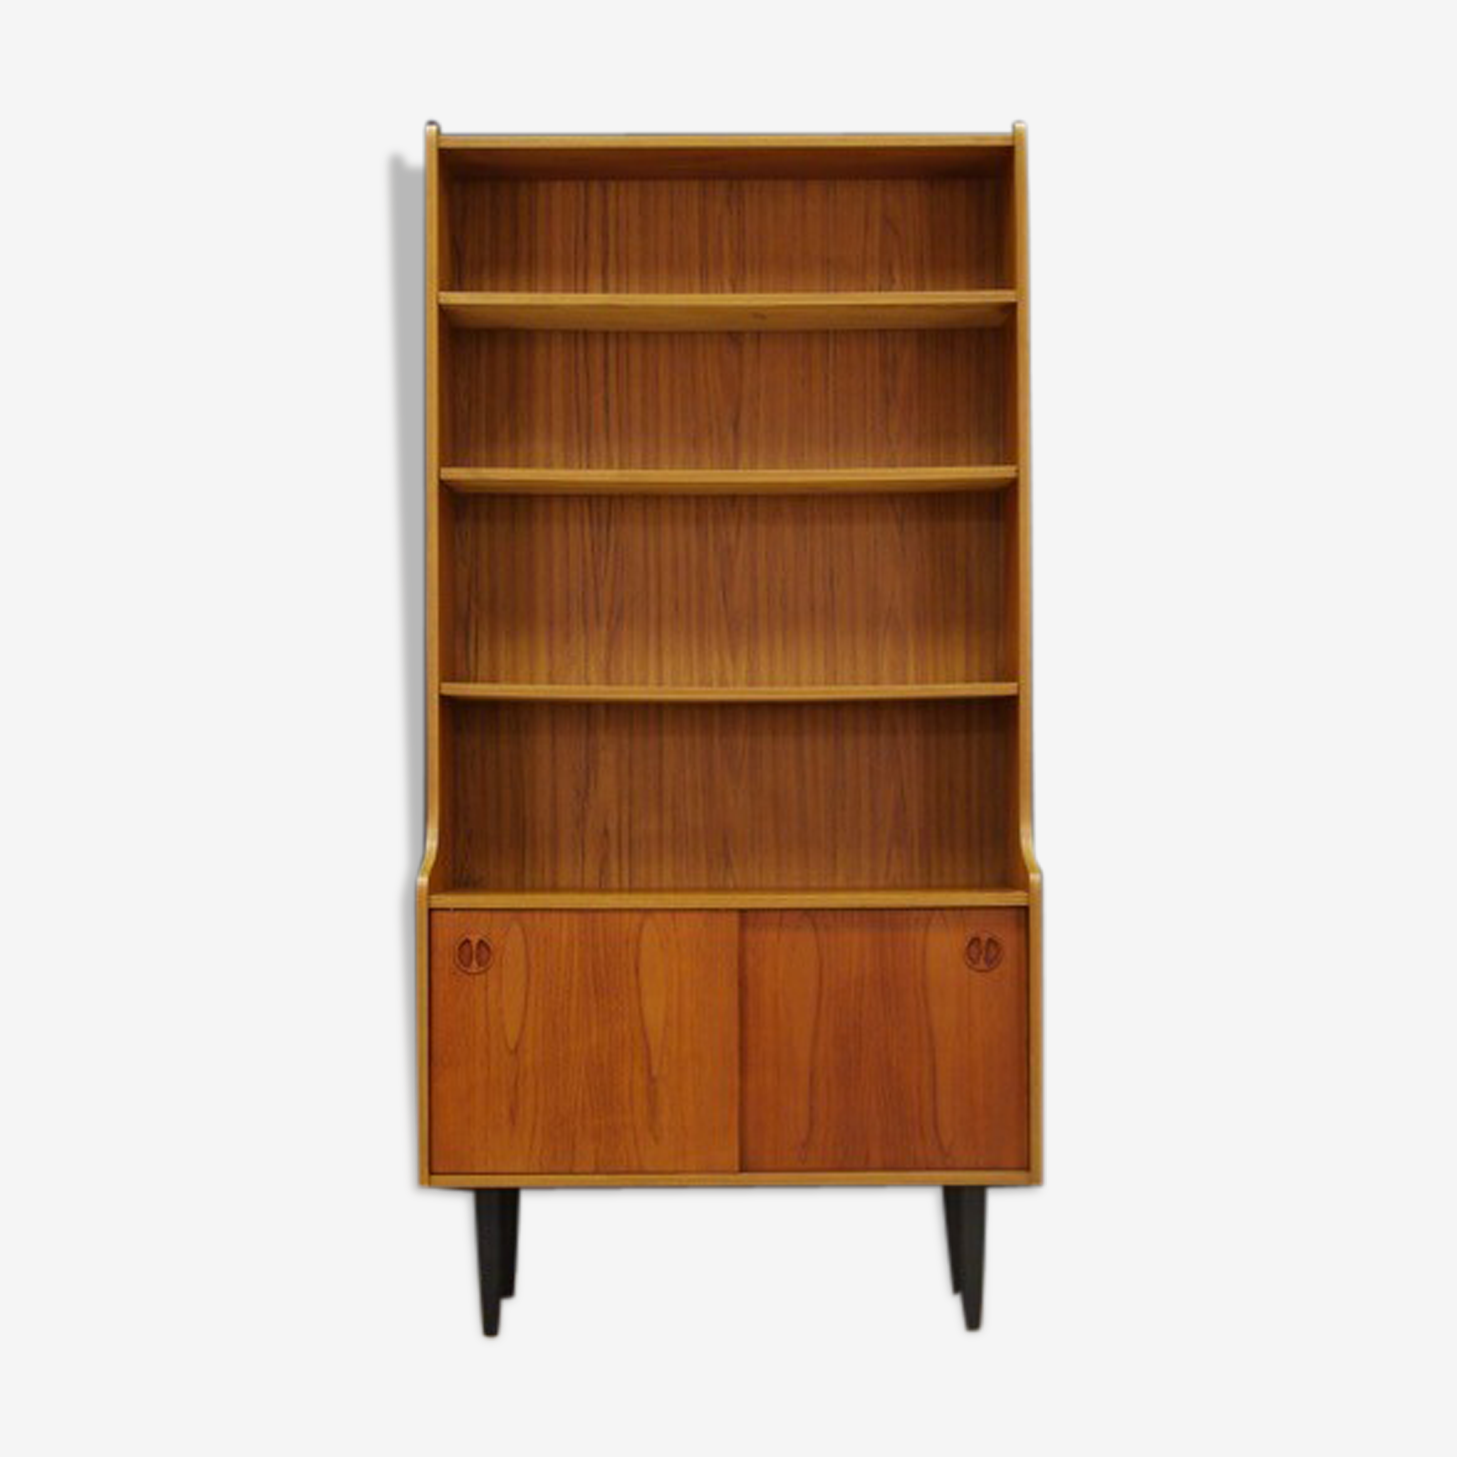 Mid-century retro vintage teak bookcase